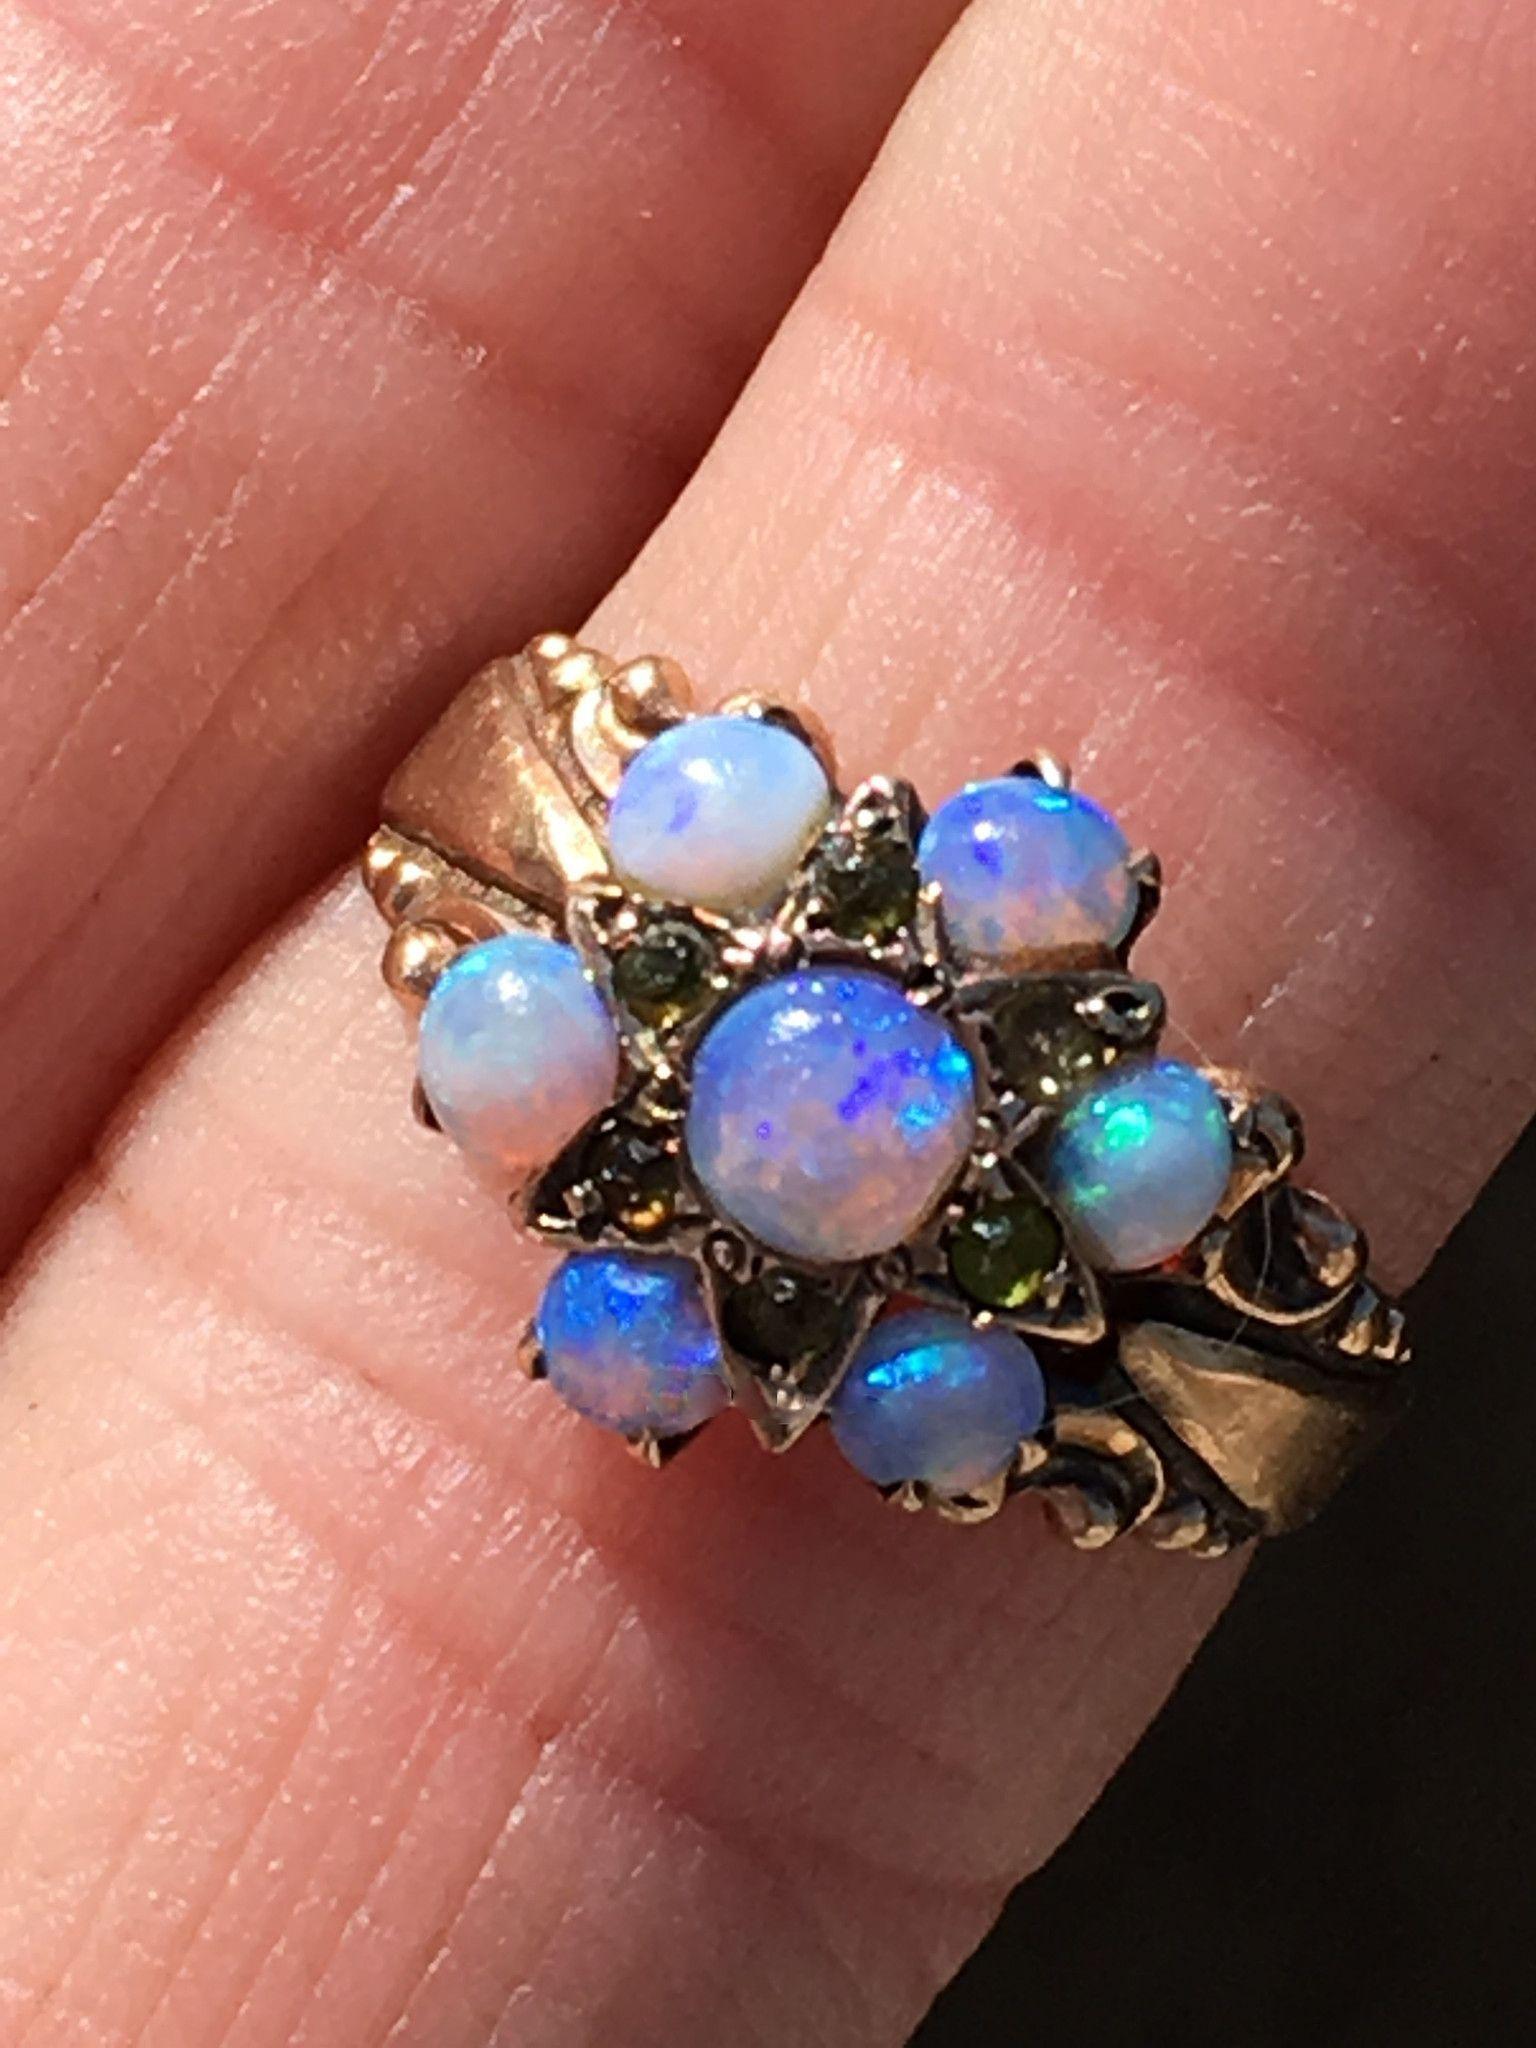 Opal Ring Victorian Era 10K Gold White gold engagement